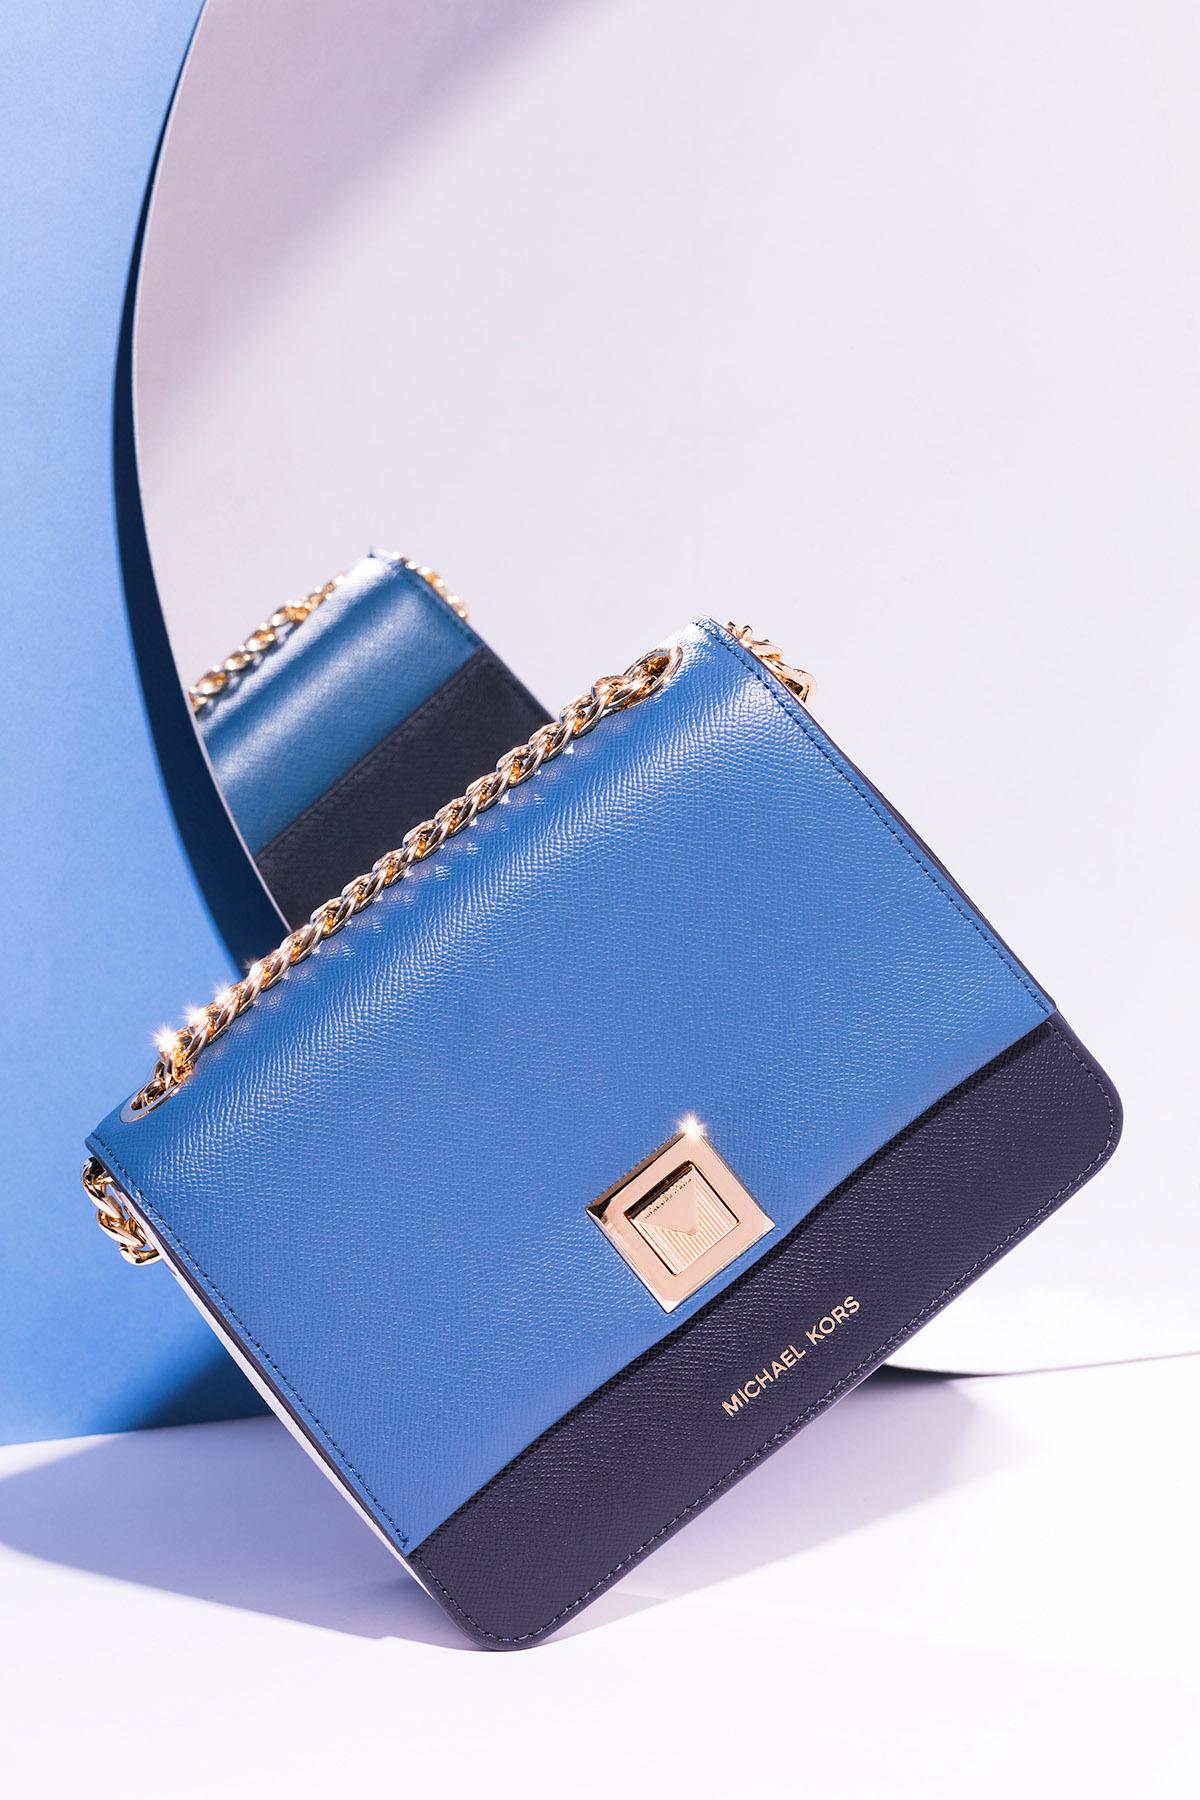 Commercial photography of Michael Kors Sylvia handbag by Loesje Kessels Fashion Photographer